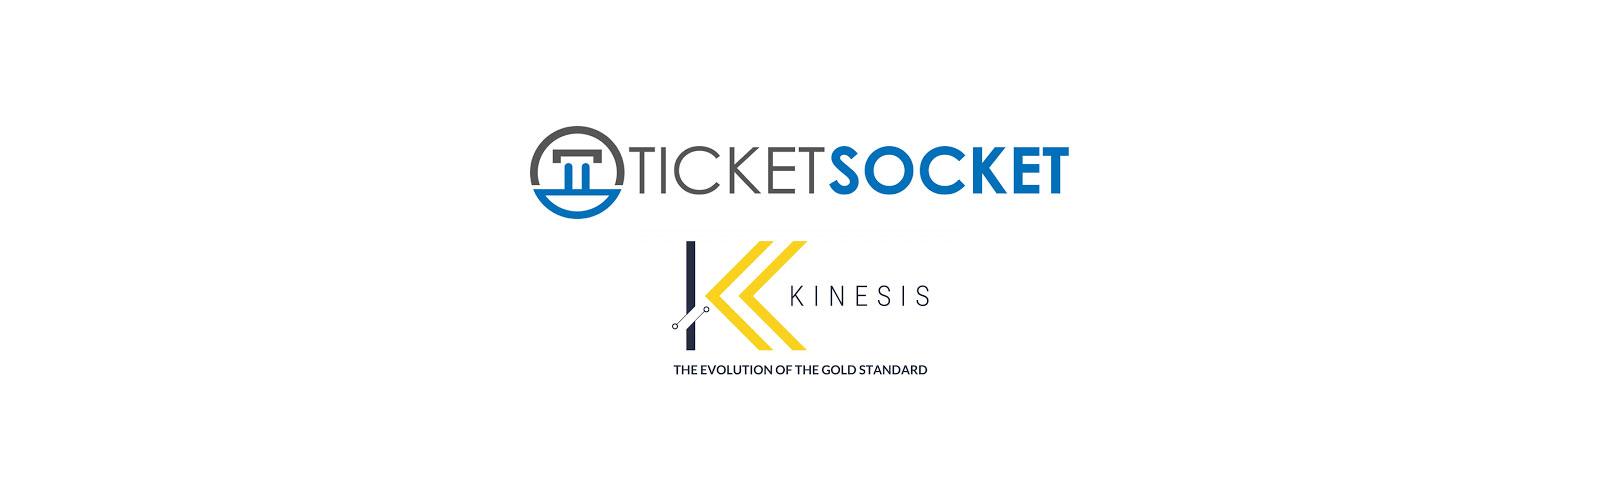 ticketsocket-kinesis